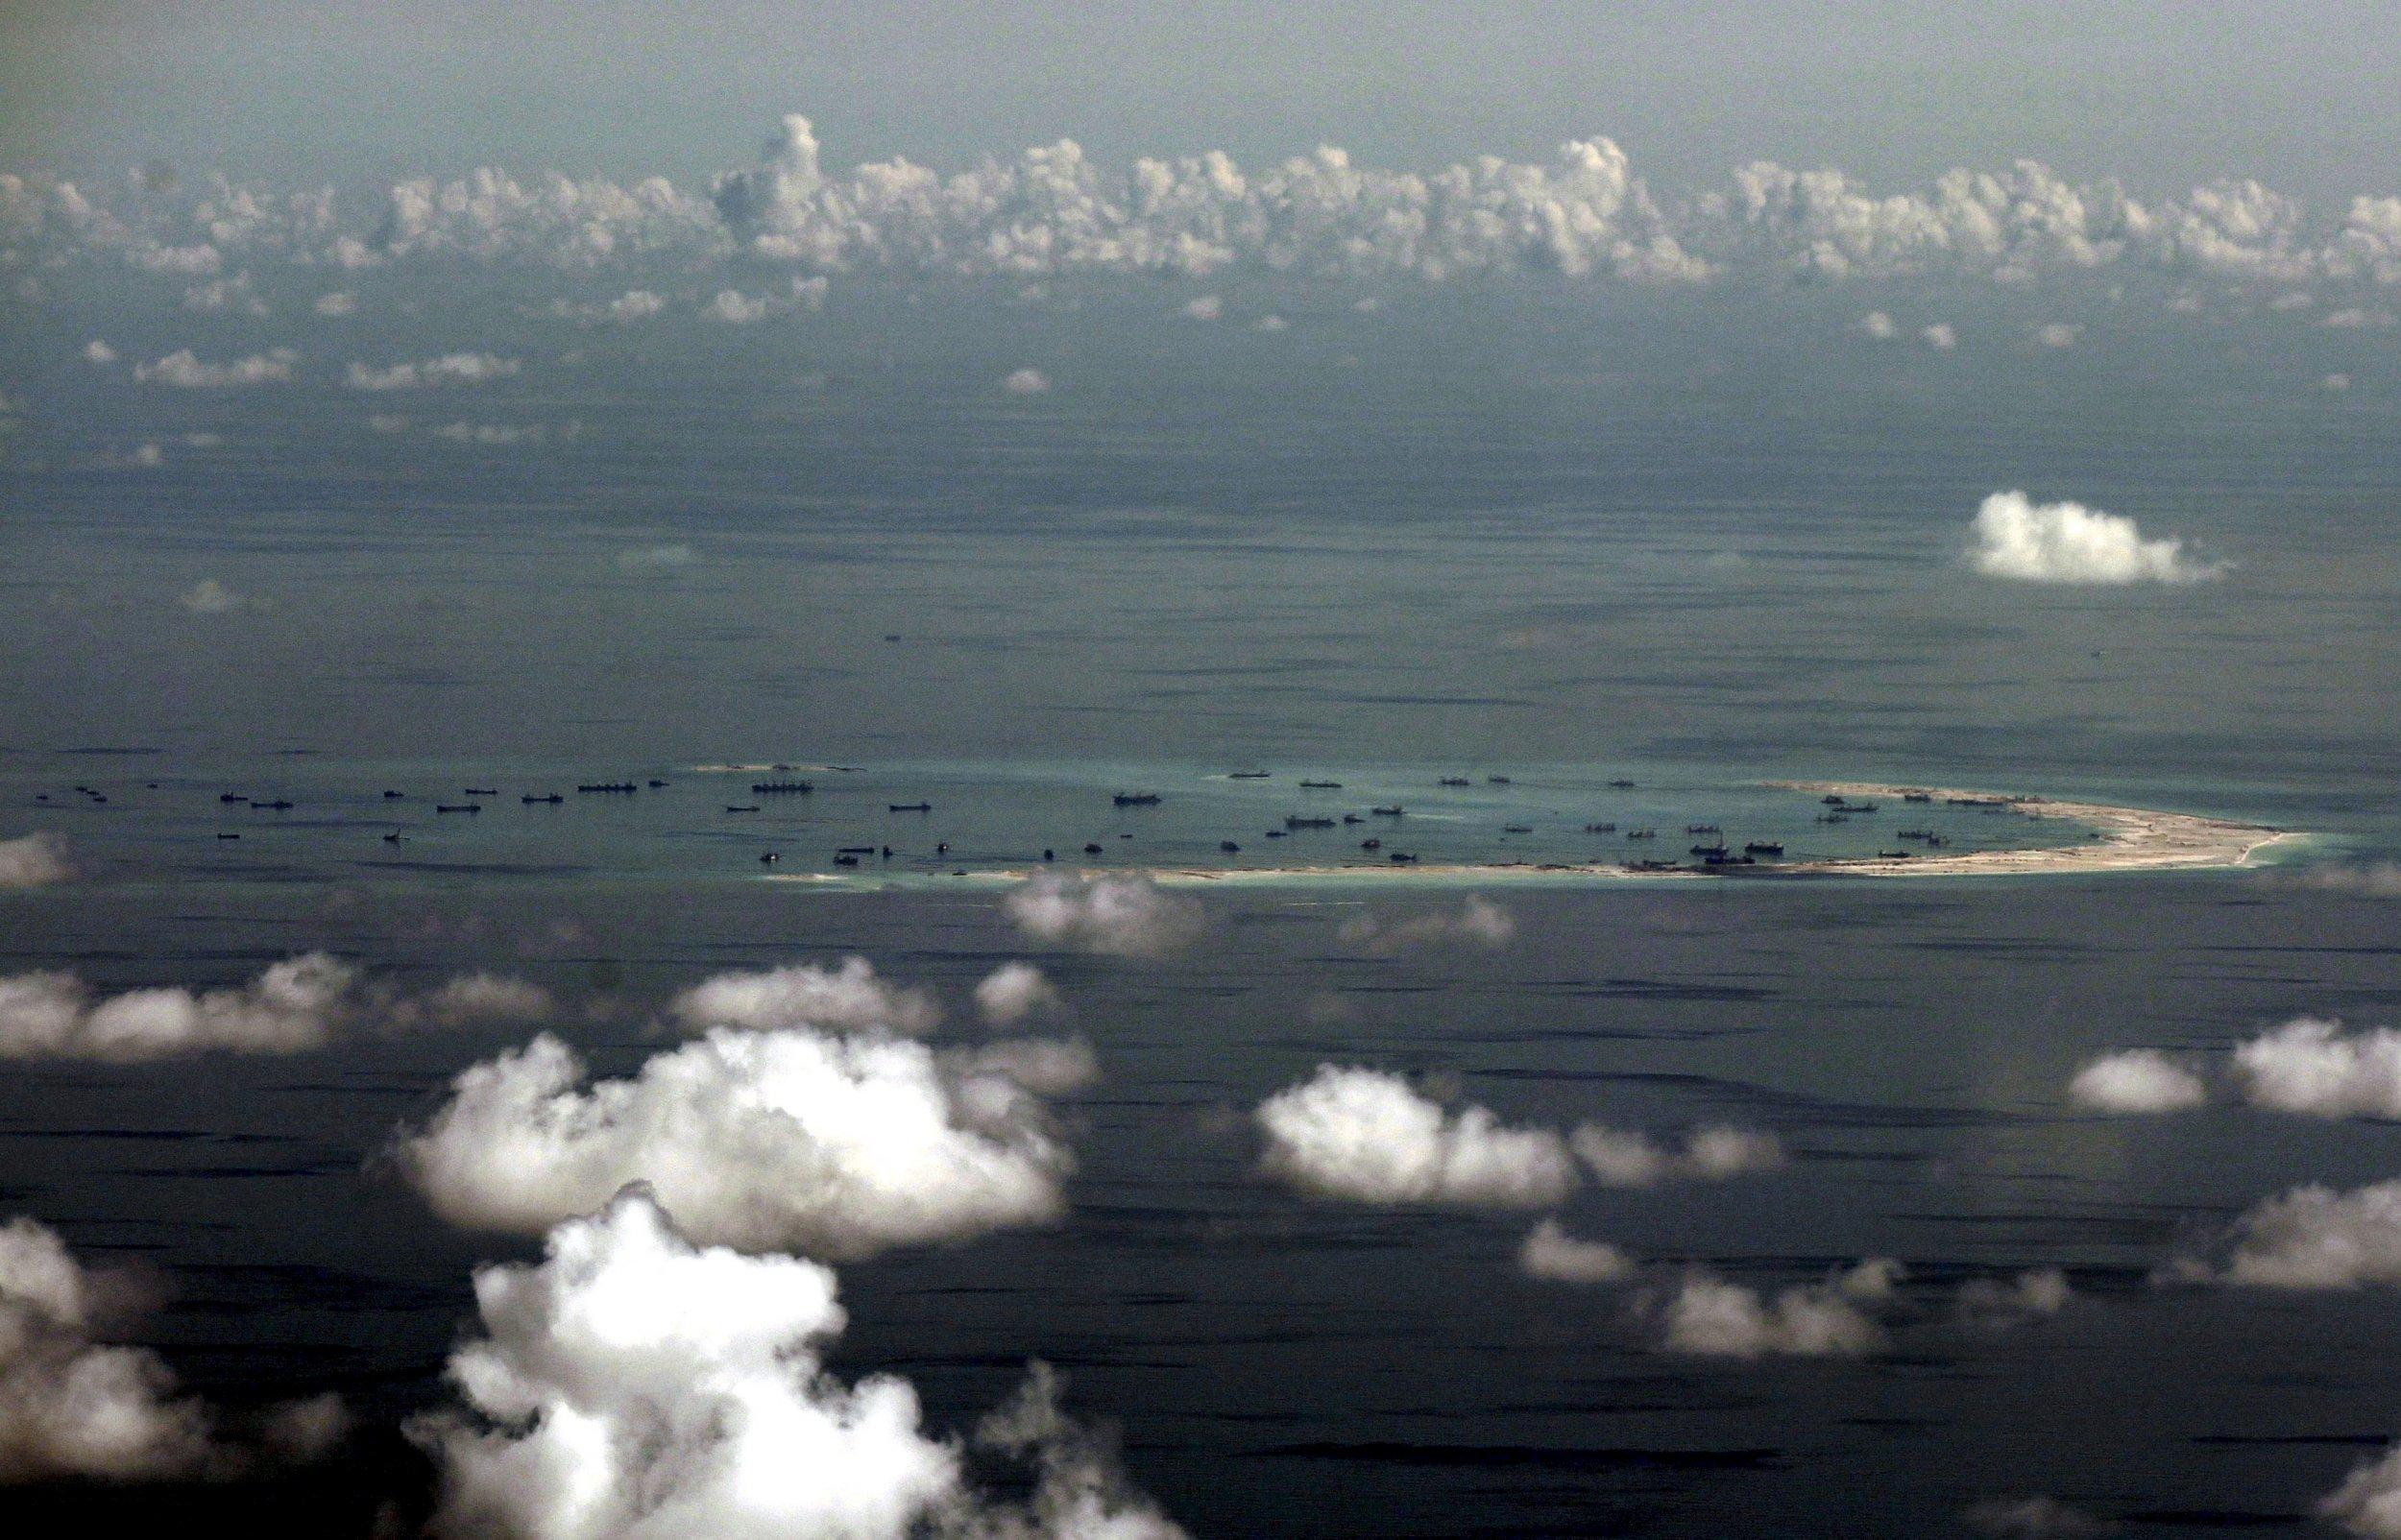 South China Sea B-52 bomber